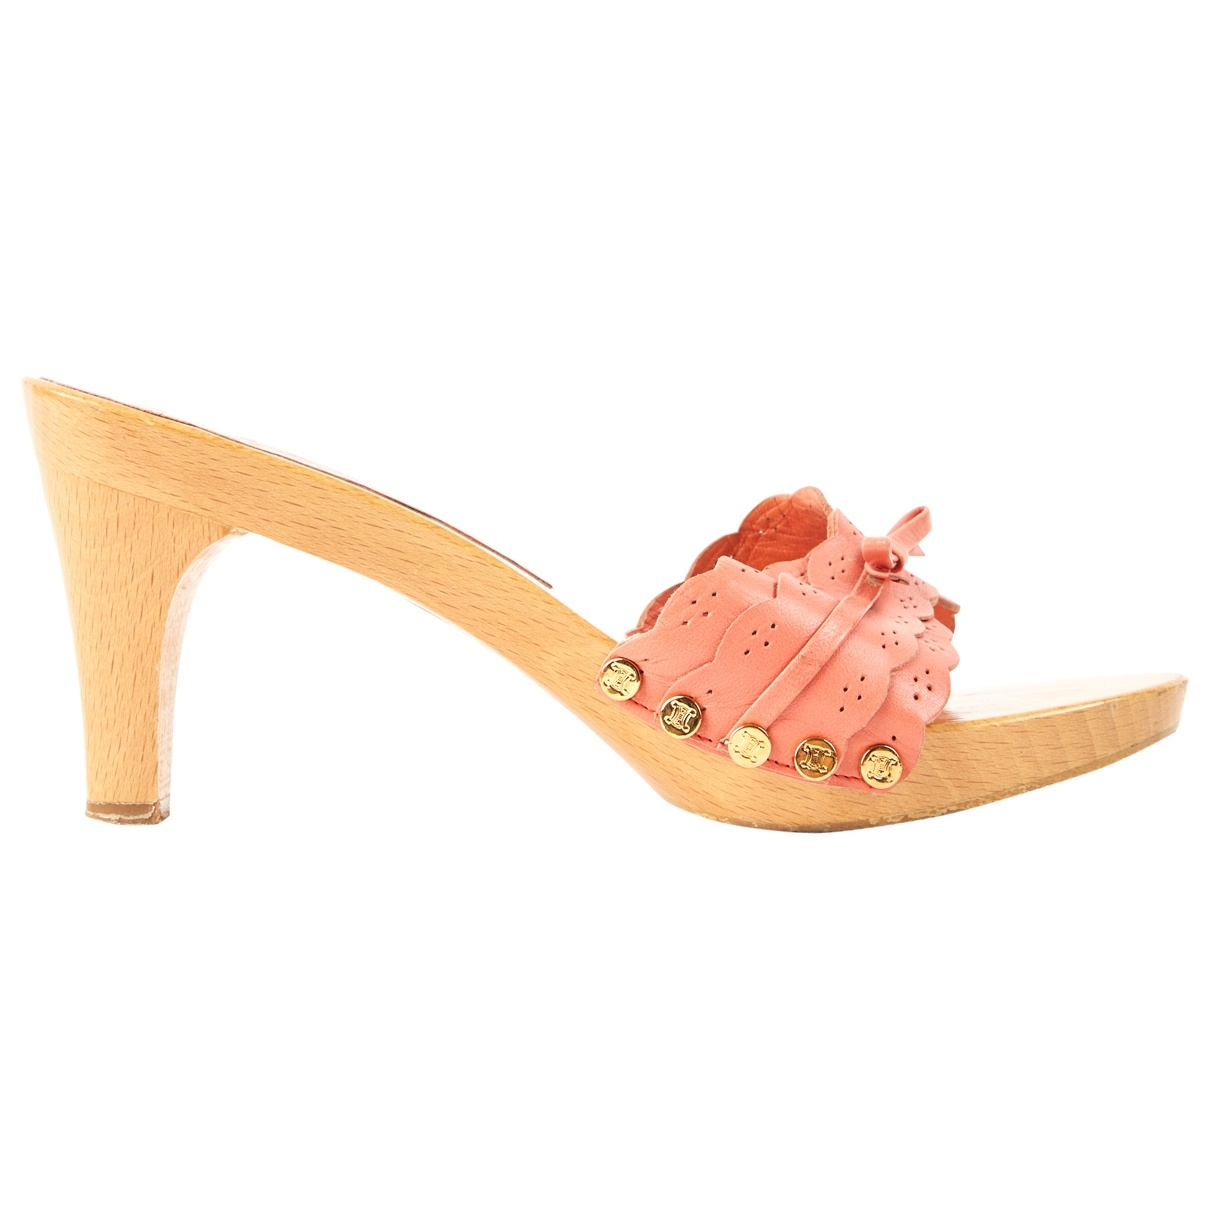 Celine - Sandales   pour femme en cuir - beige